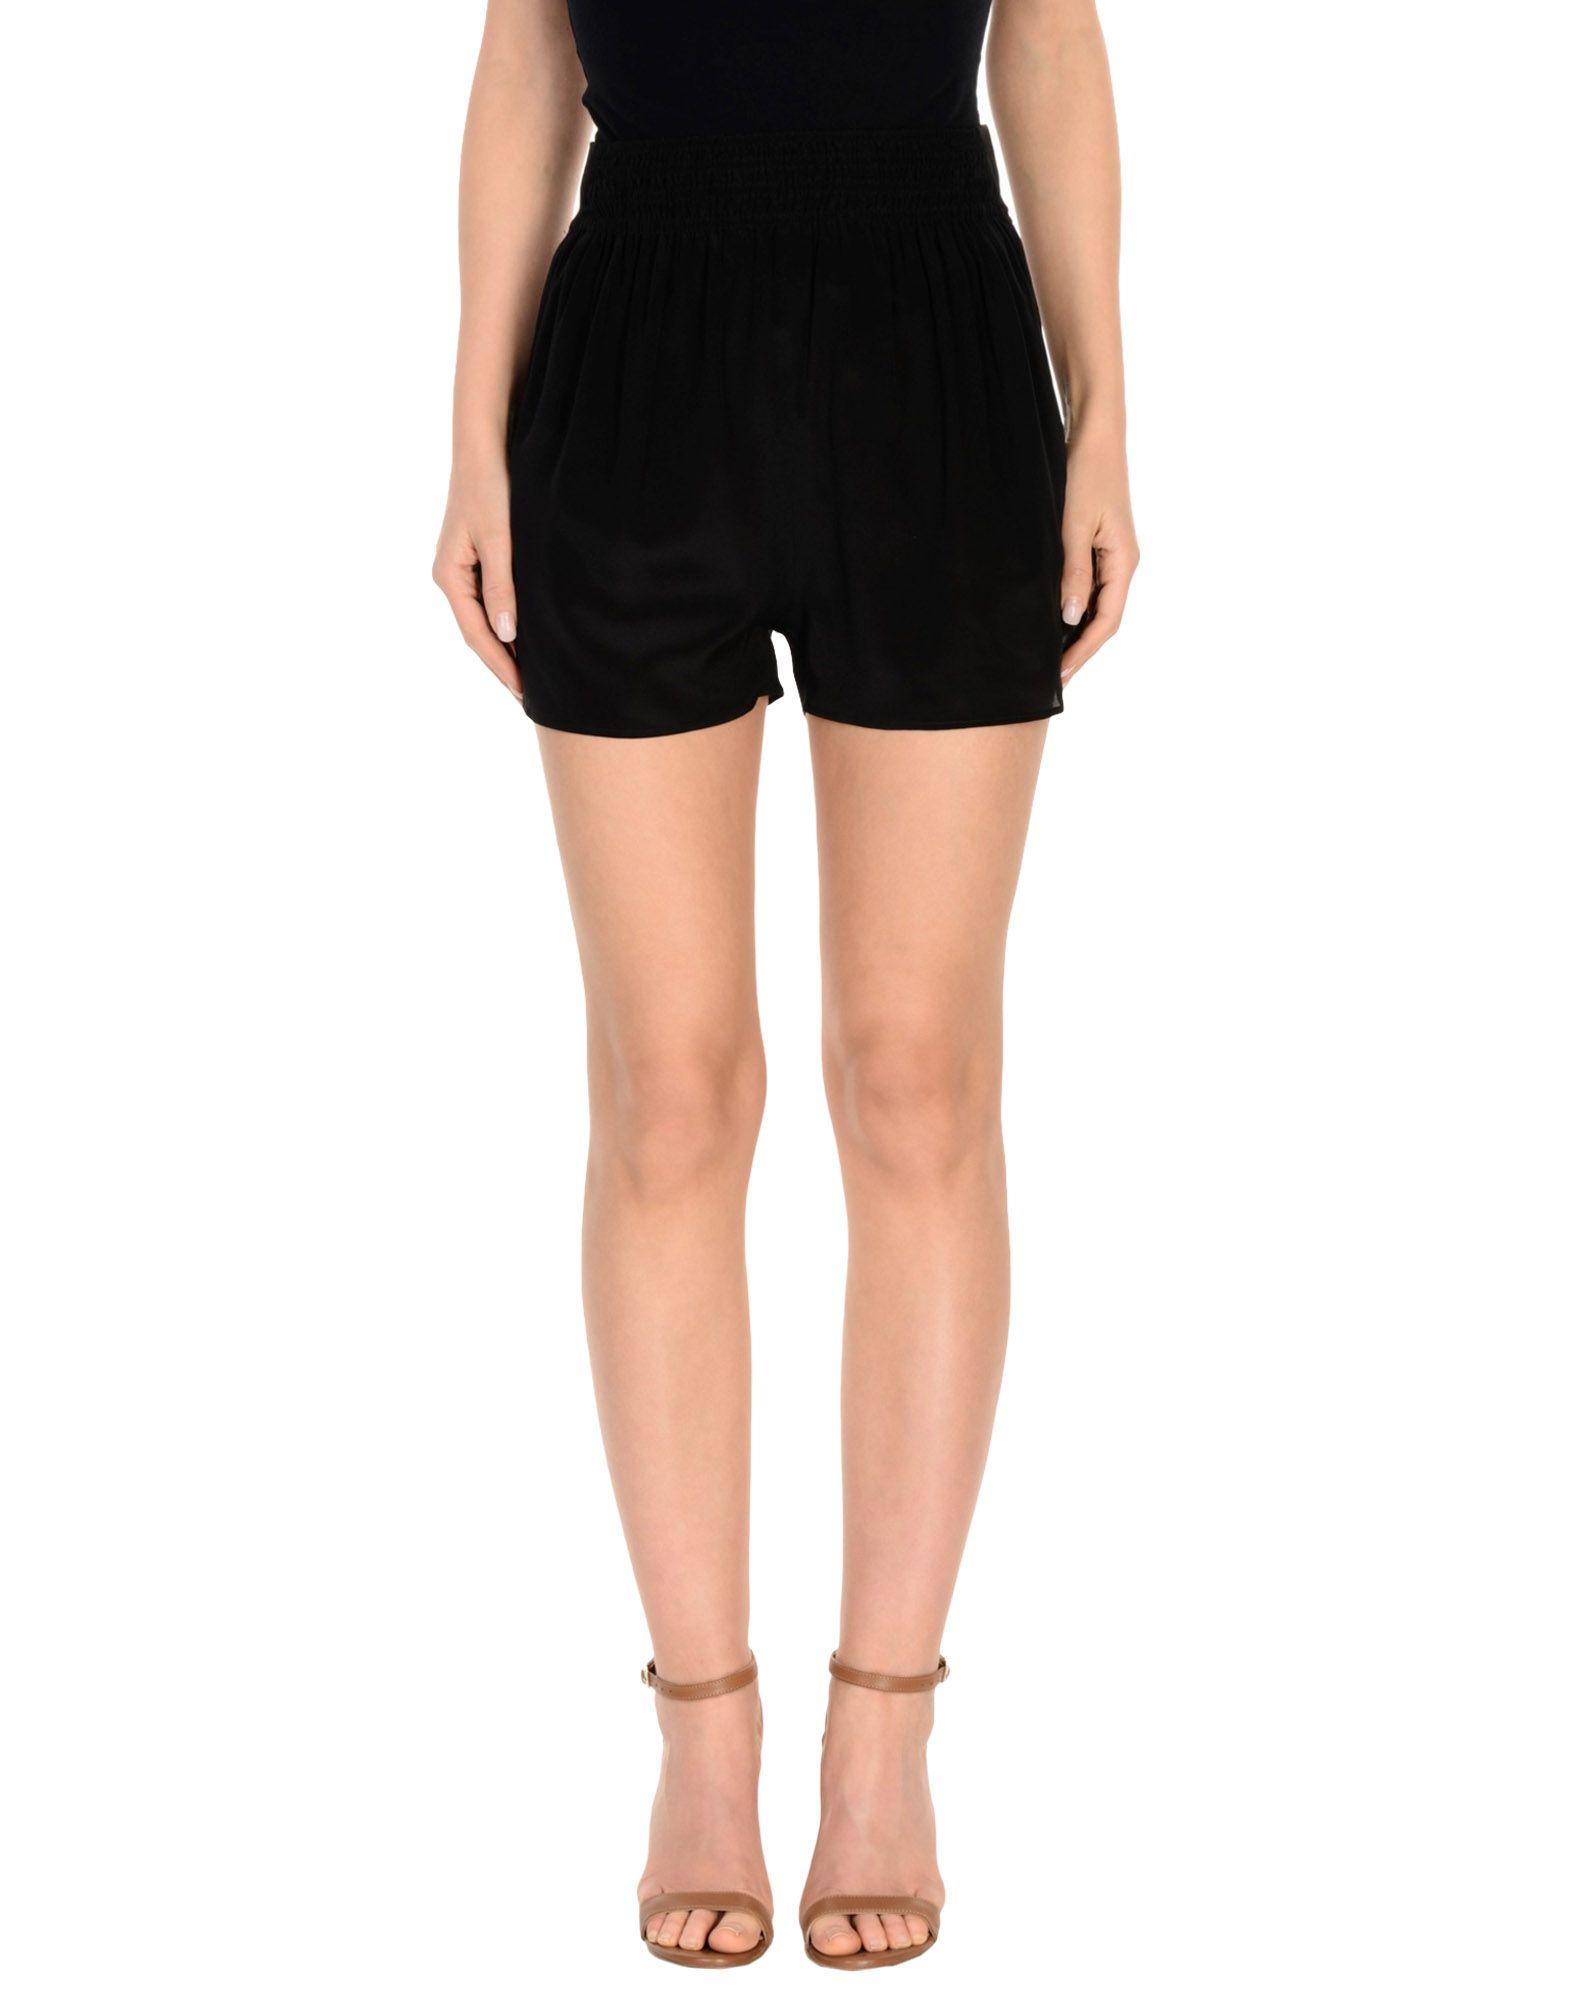 D.EFECT Shorts & Bermuda in Black